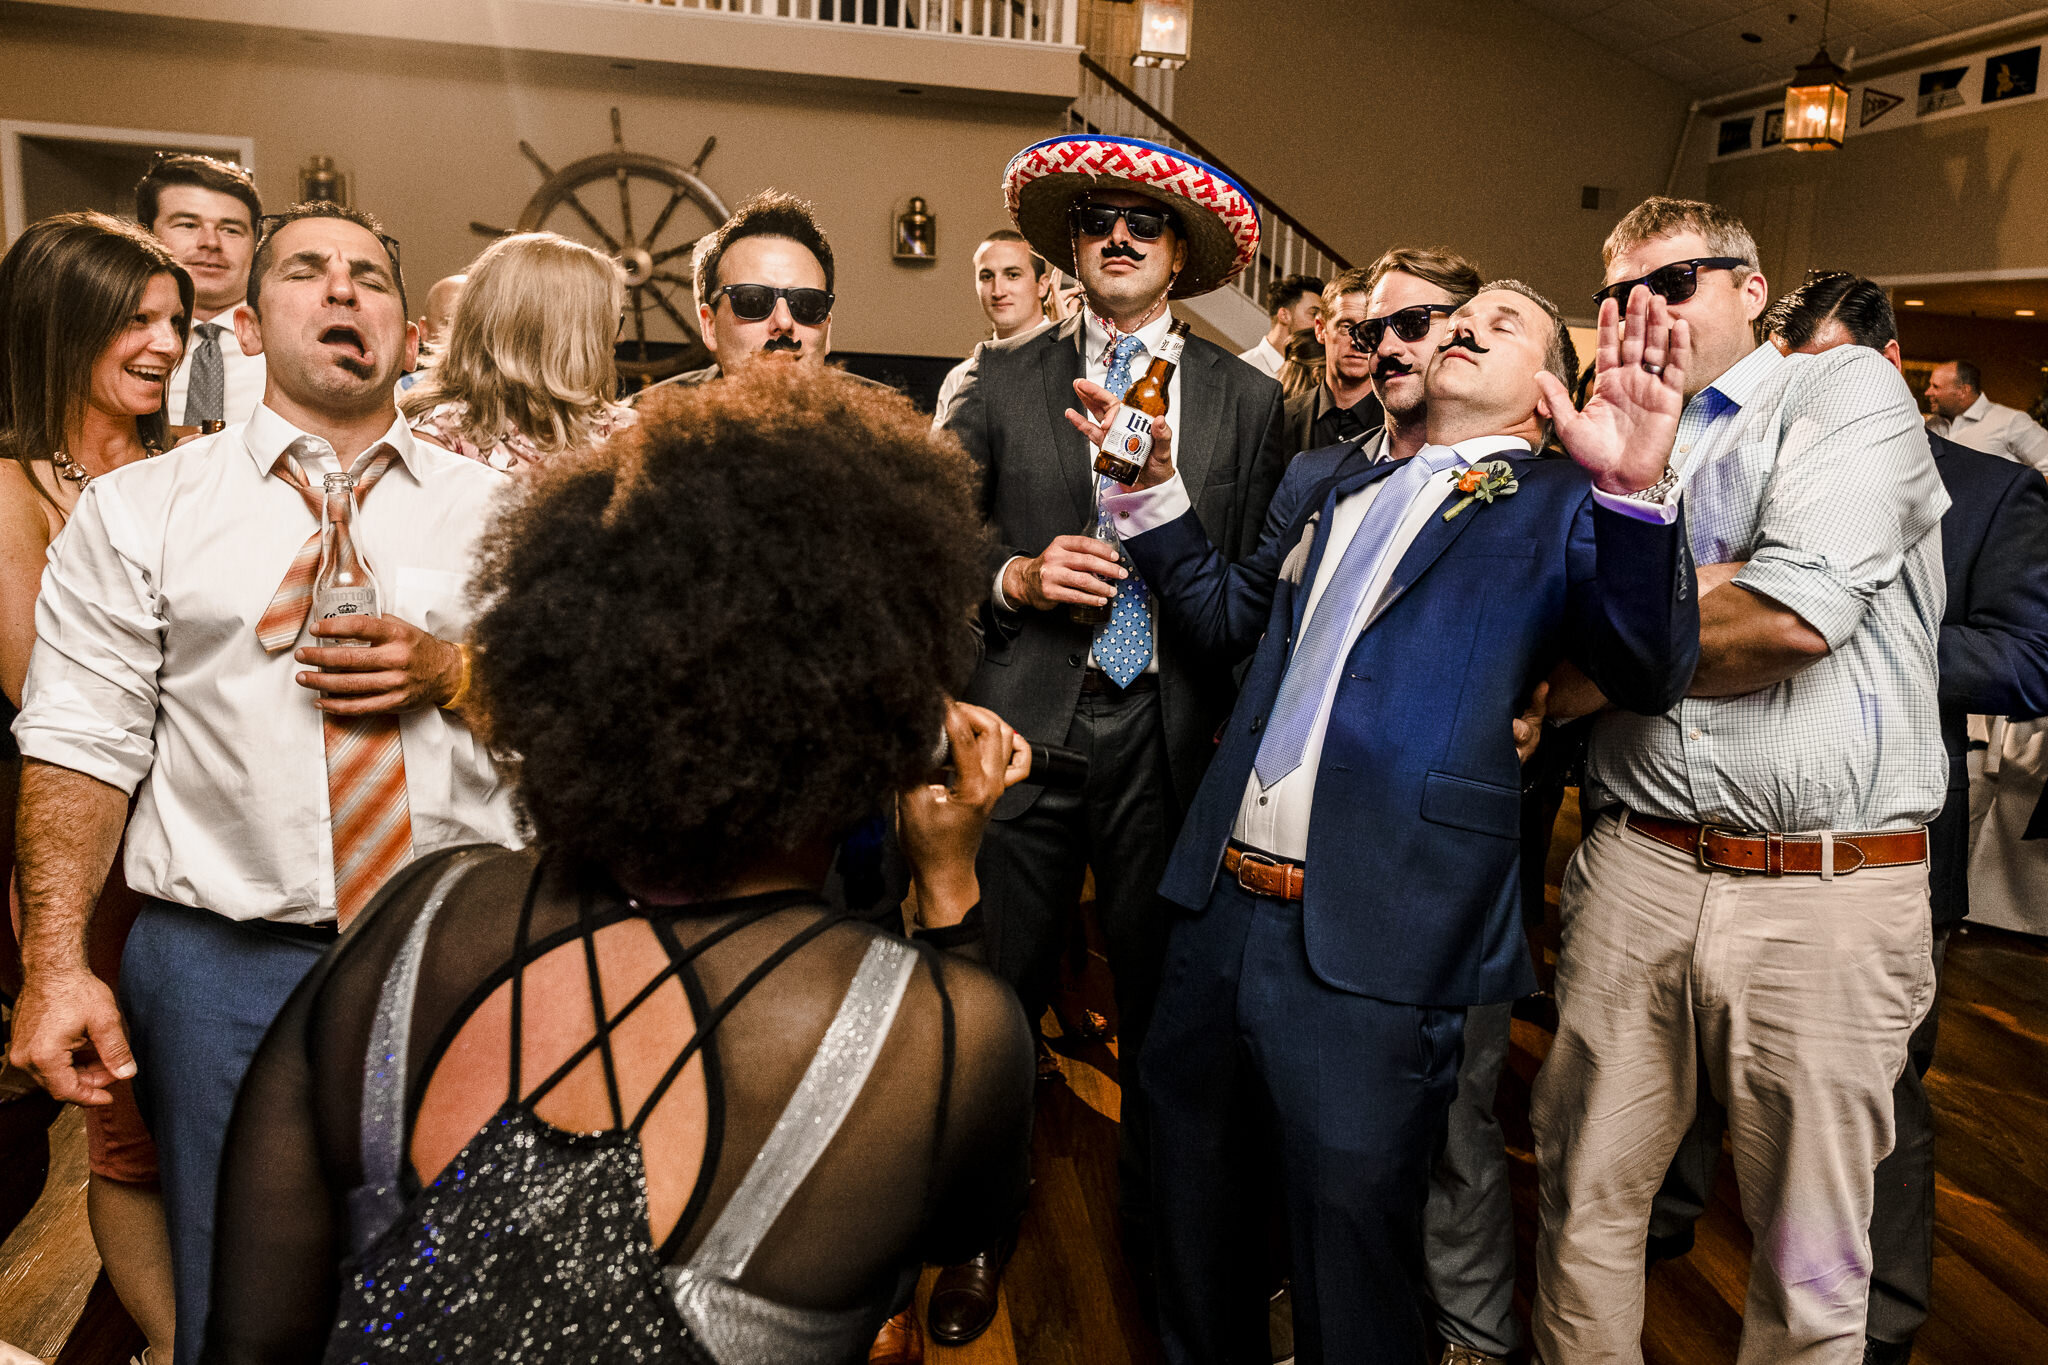 Snell-Ocean-City-Yacht-Club-New-Jersey-Wedding-Photographer-46.JPG